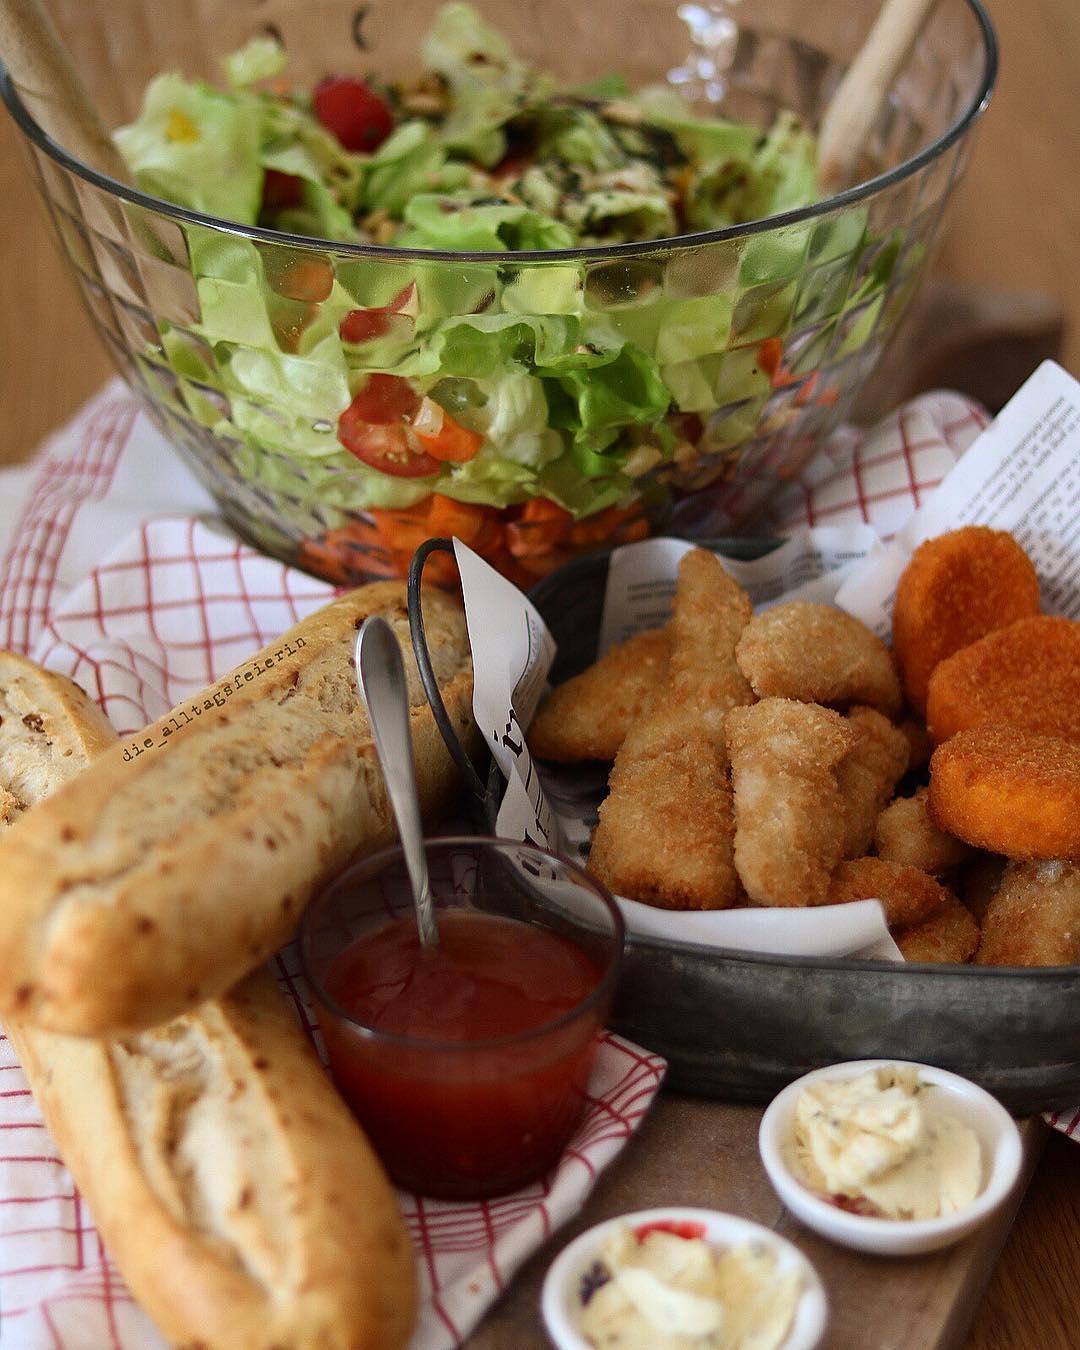 Speiseplan, Essensplan, Wochenplan, Freebie, Salat, Salat mit Fingerfood, Balsamicodressing, Fingerfood, Freebie, Dips